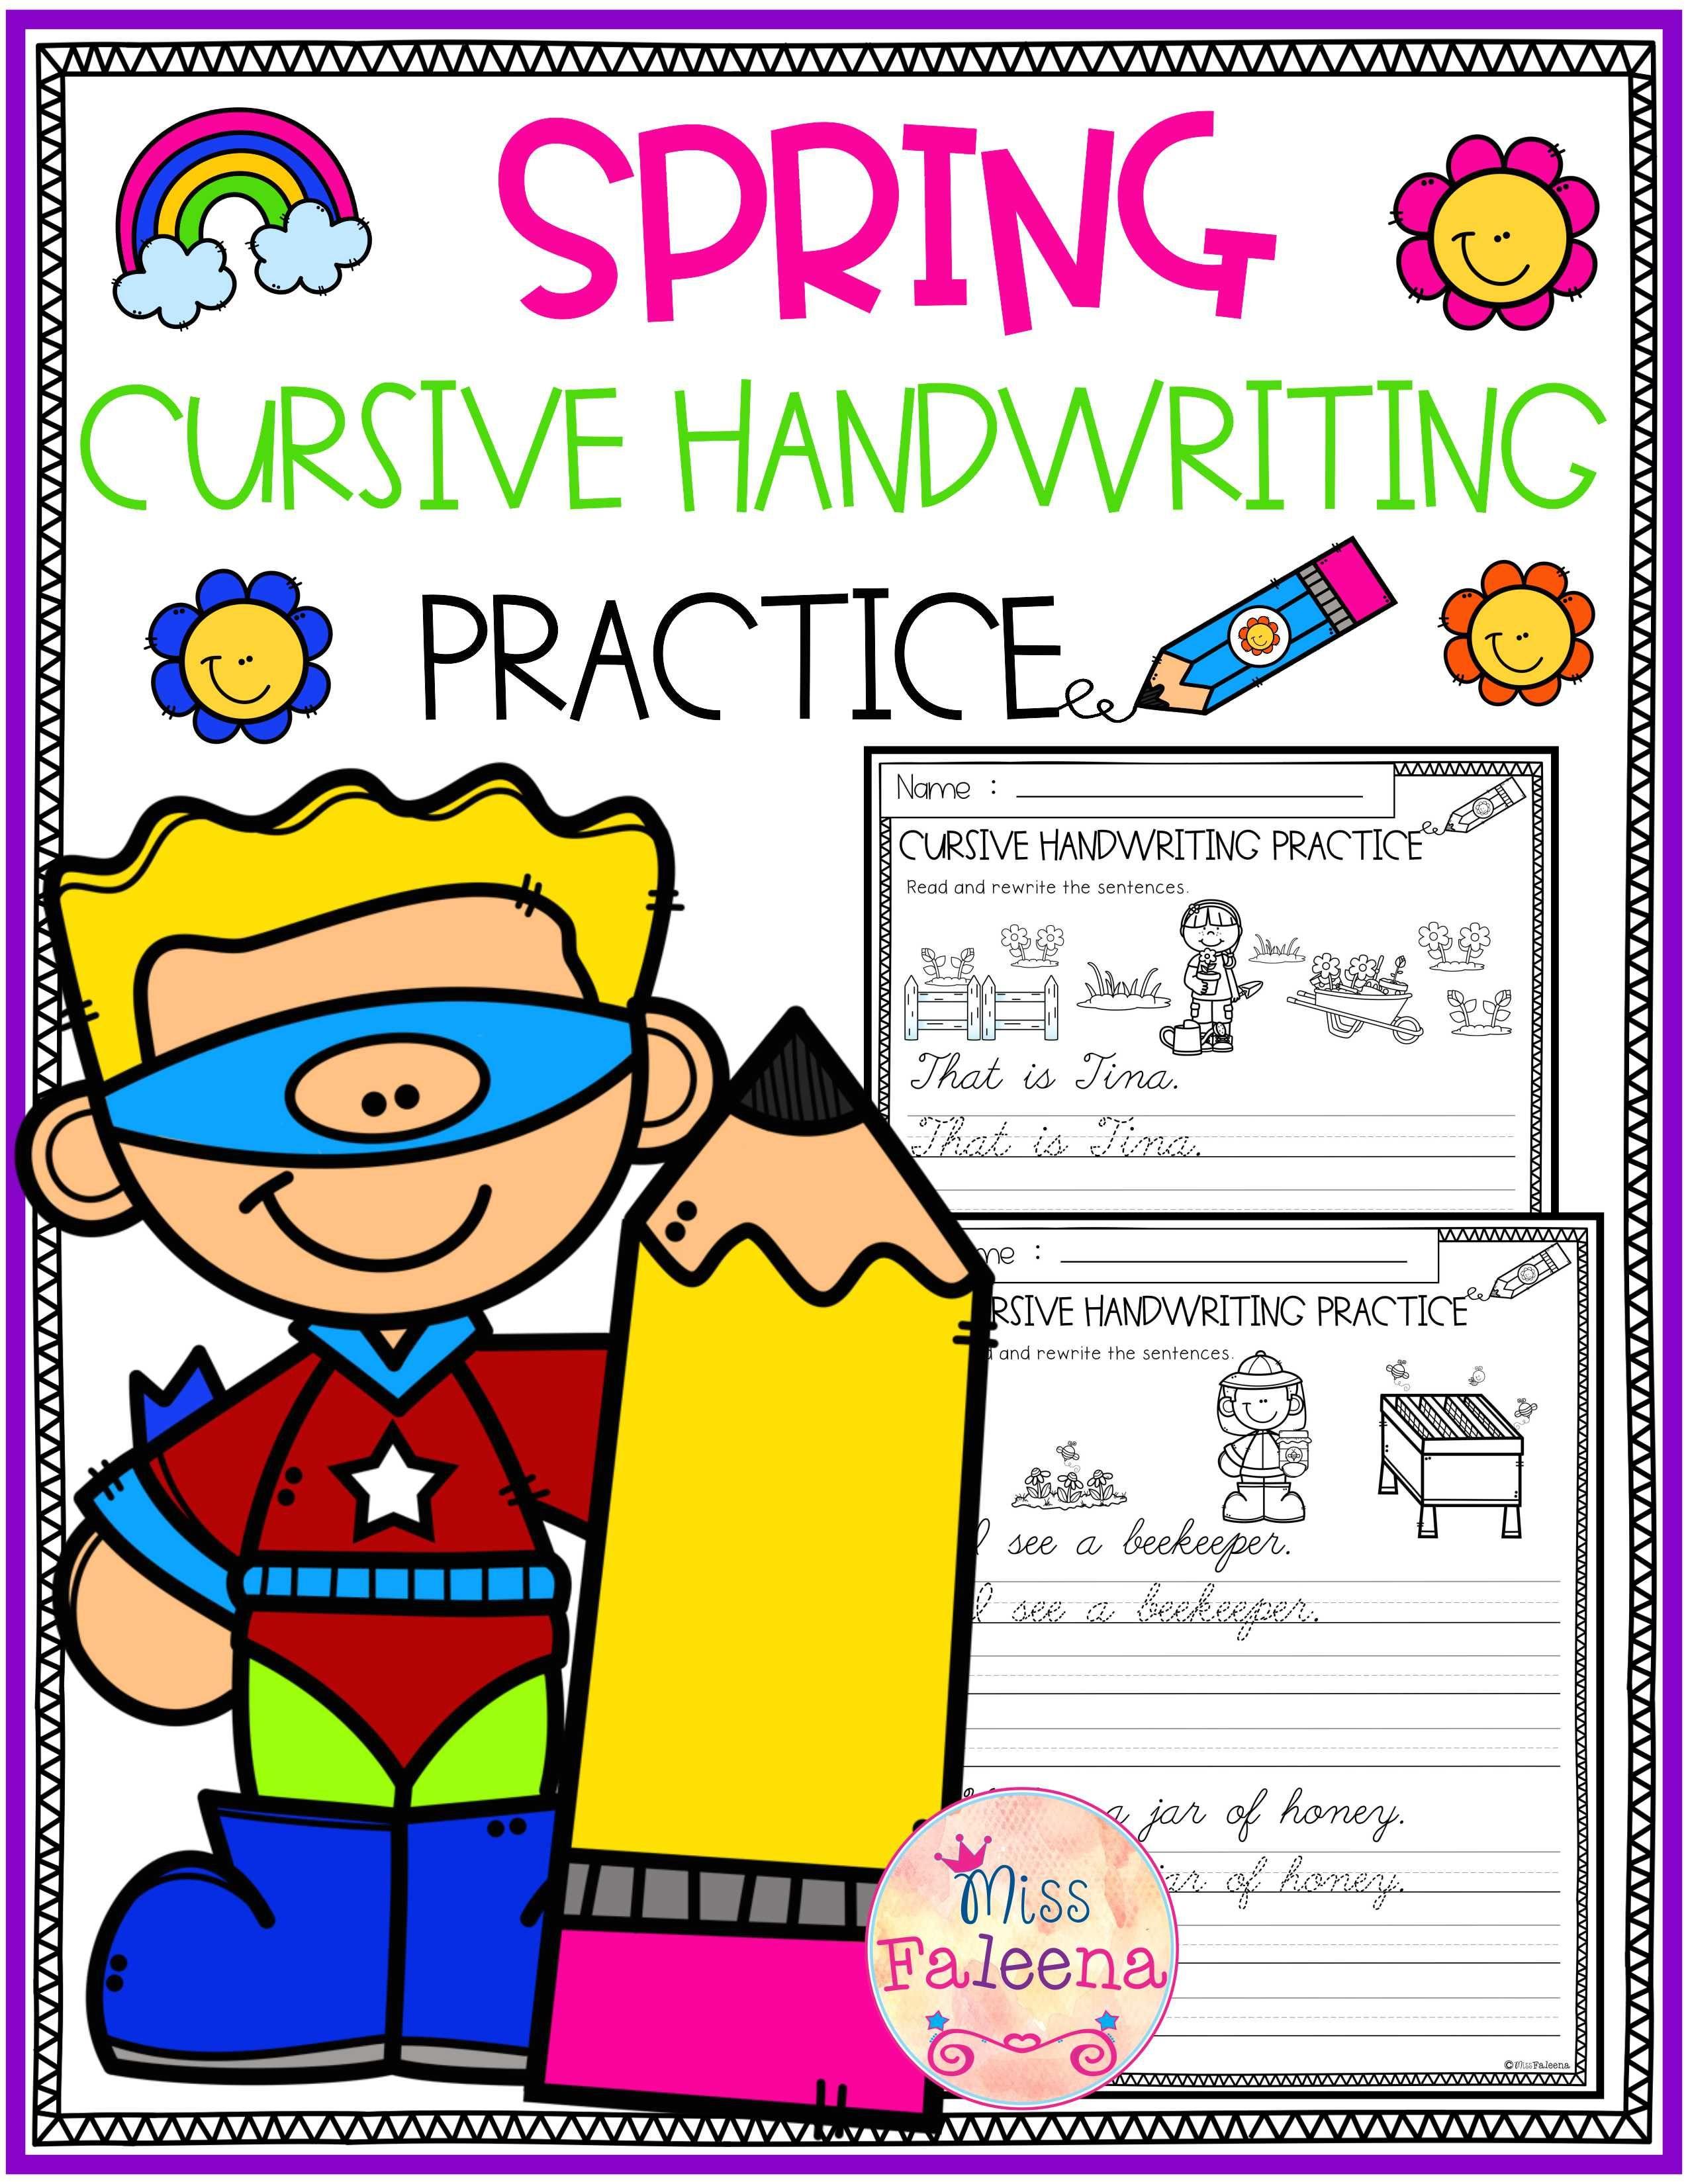 Spring Cursive Handwriting Practice